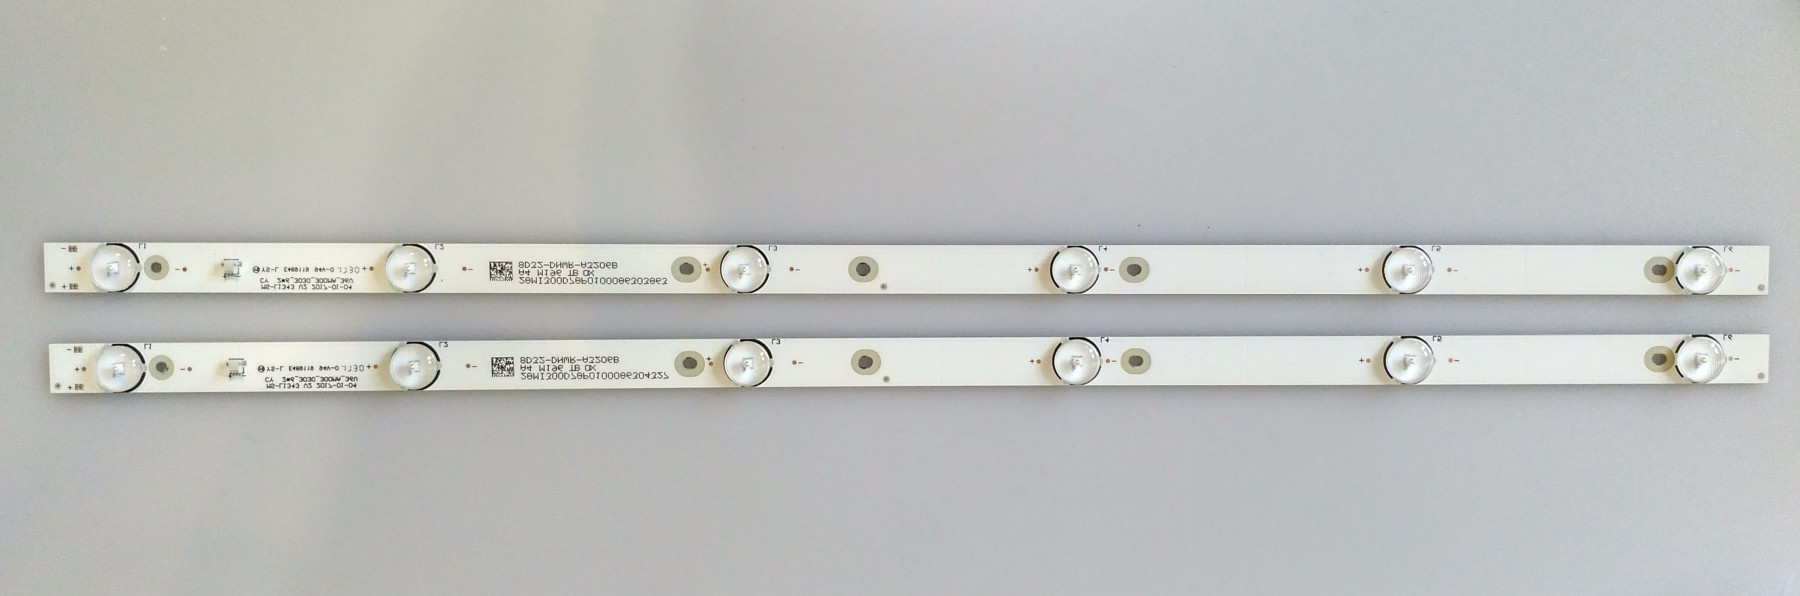 Диодна лента 1бр.MS-L1343 V2